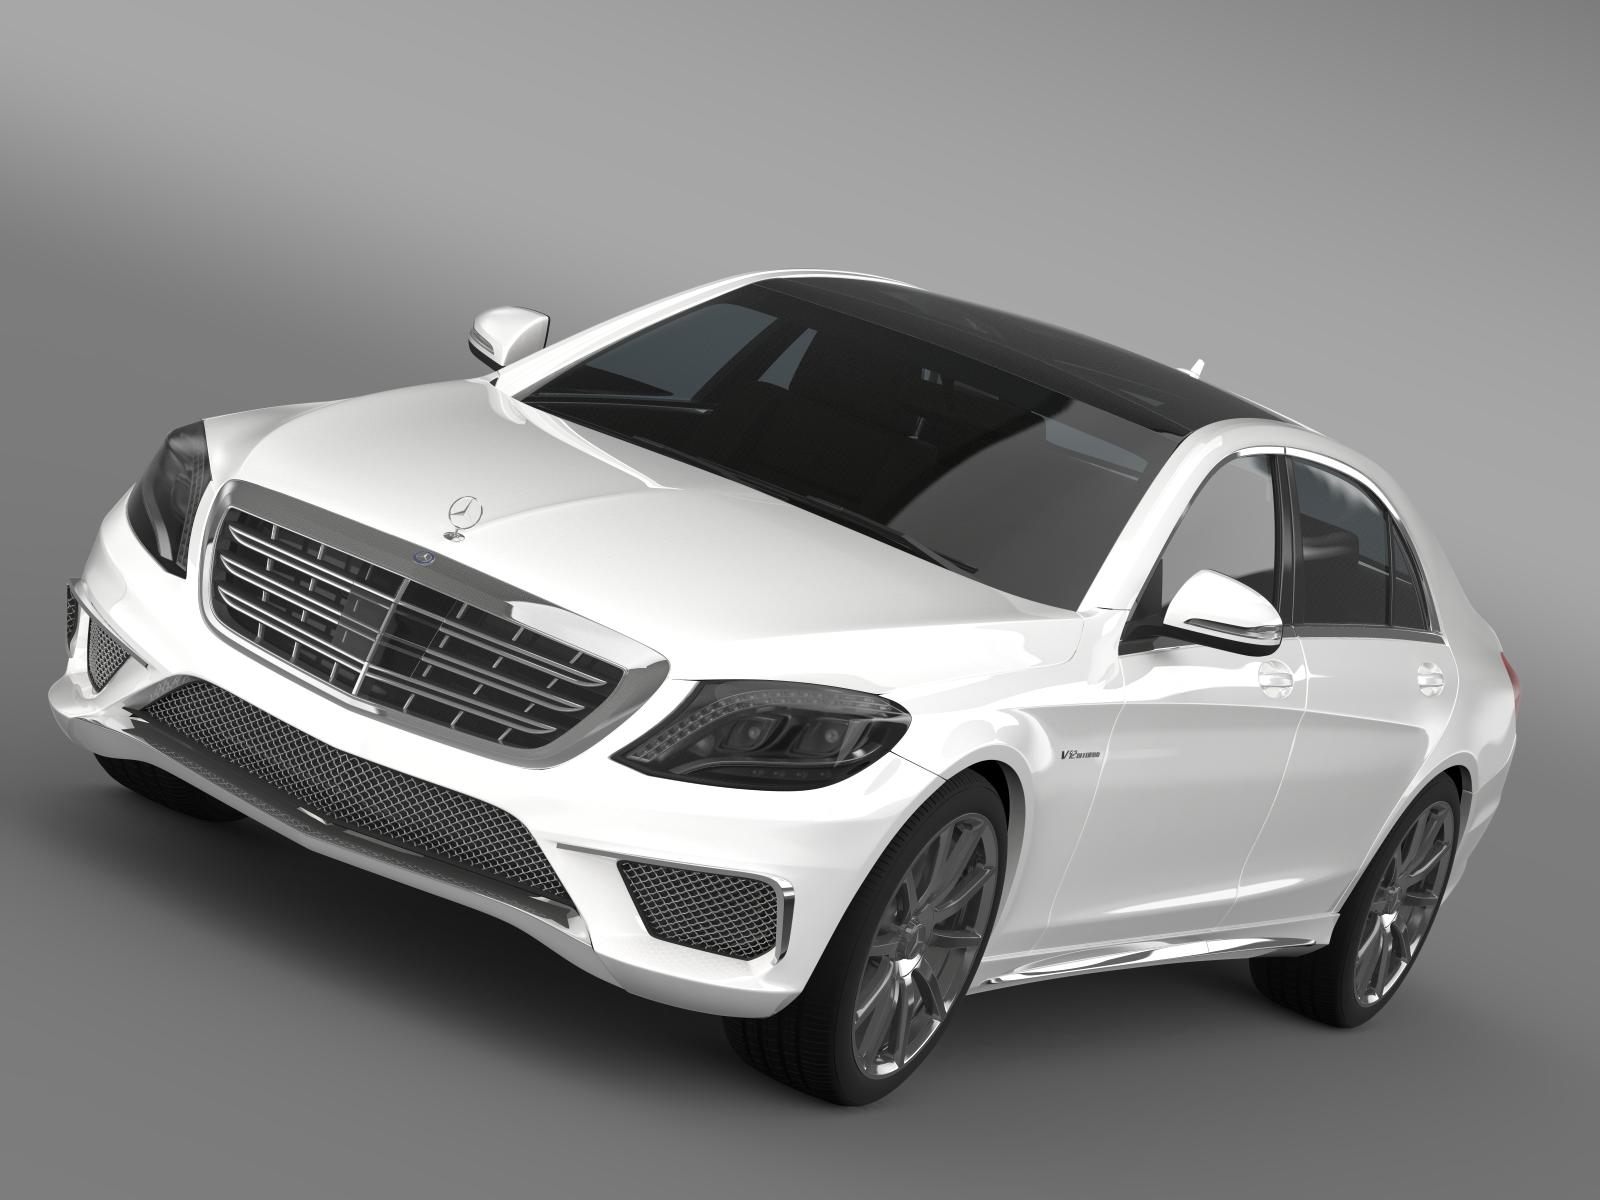 Mercedes benz s 65 amg w222 2014 3d model buy mercedes for Buy a mercedes benz